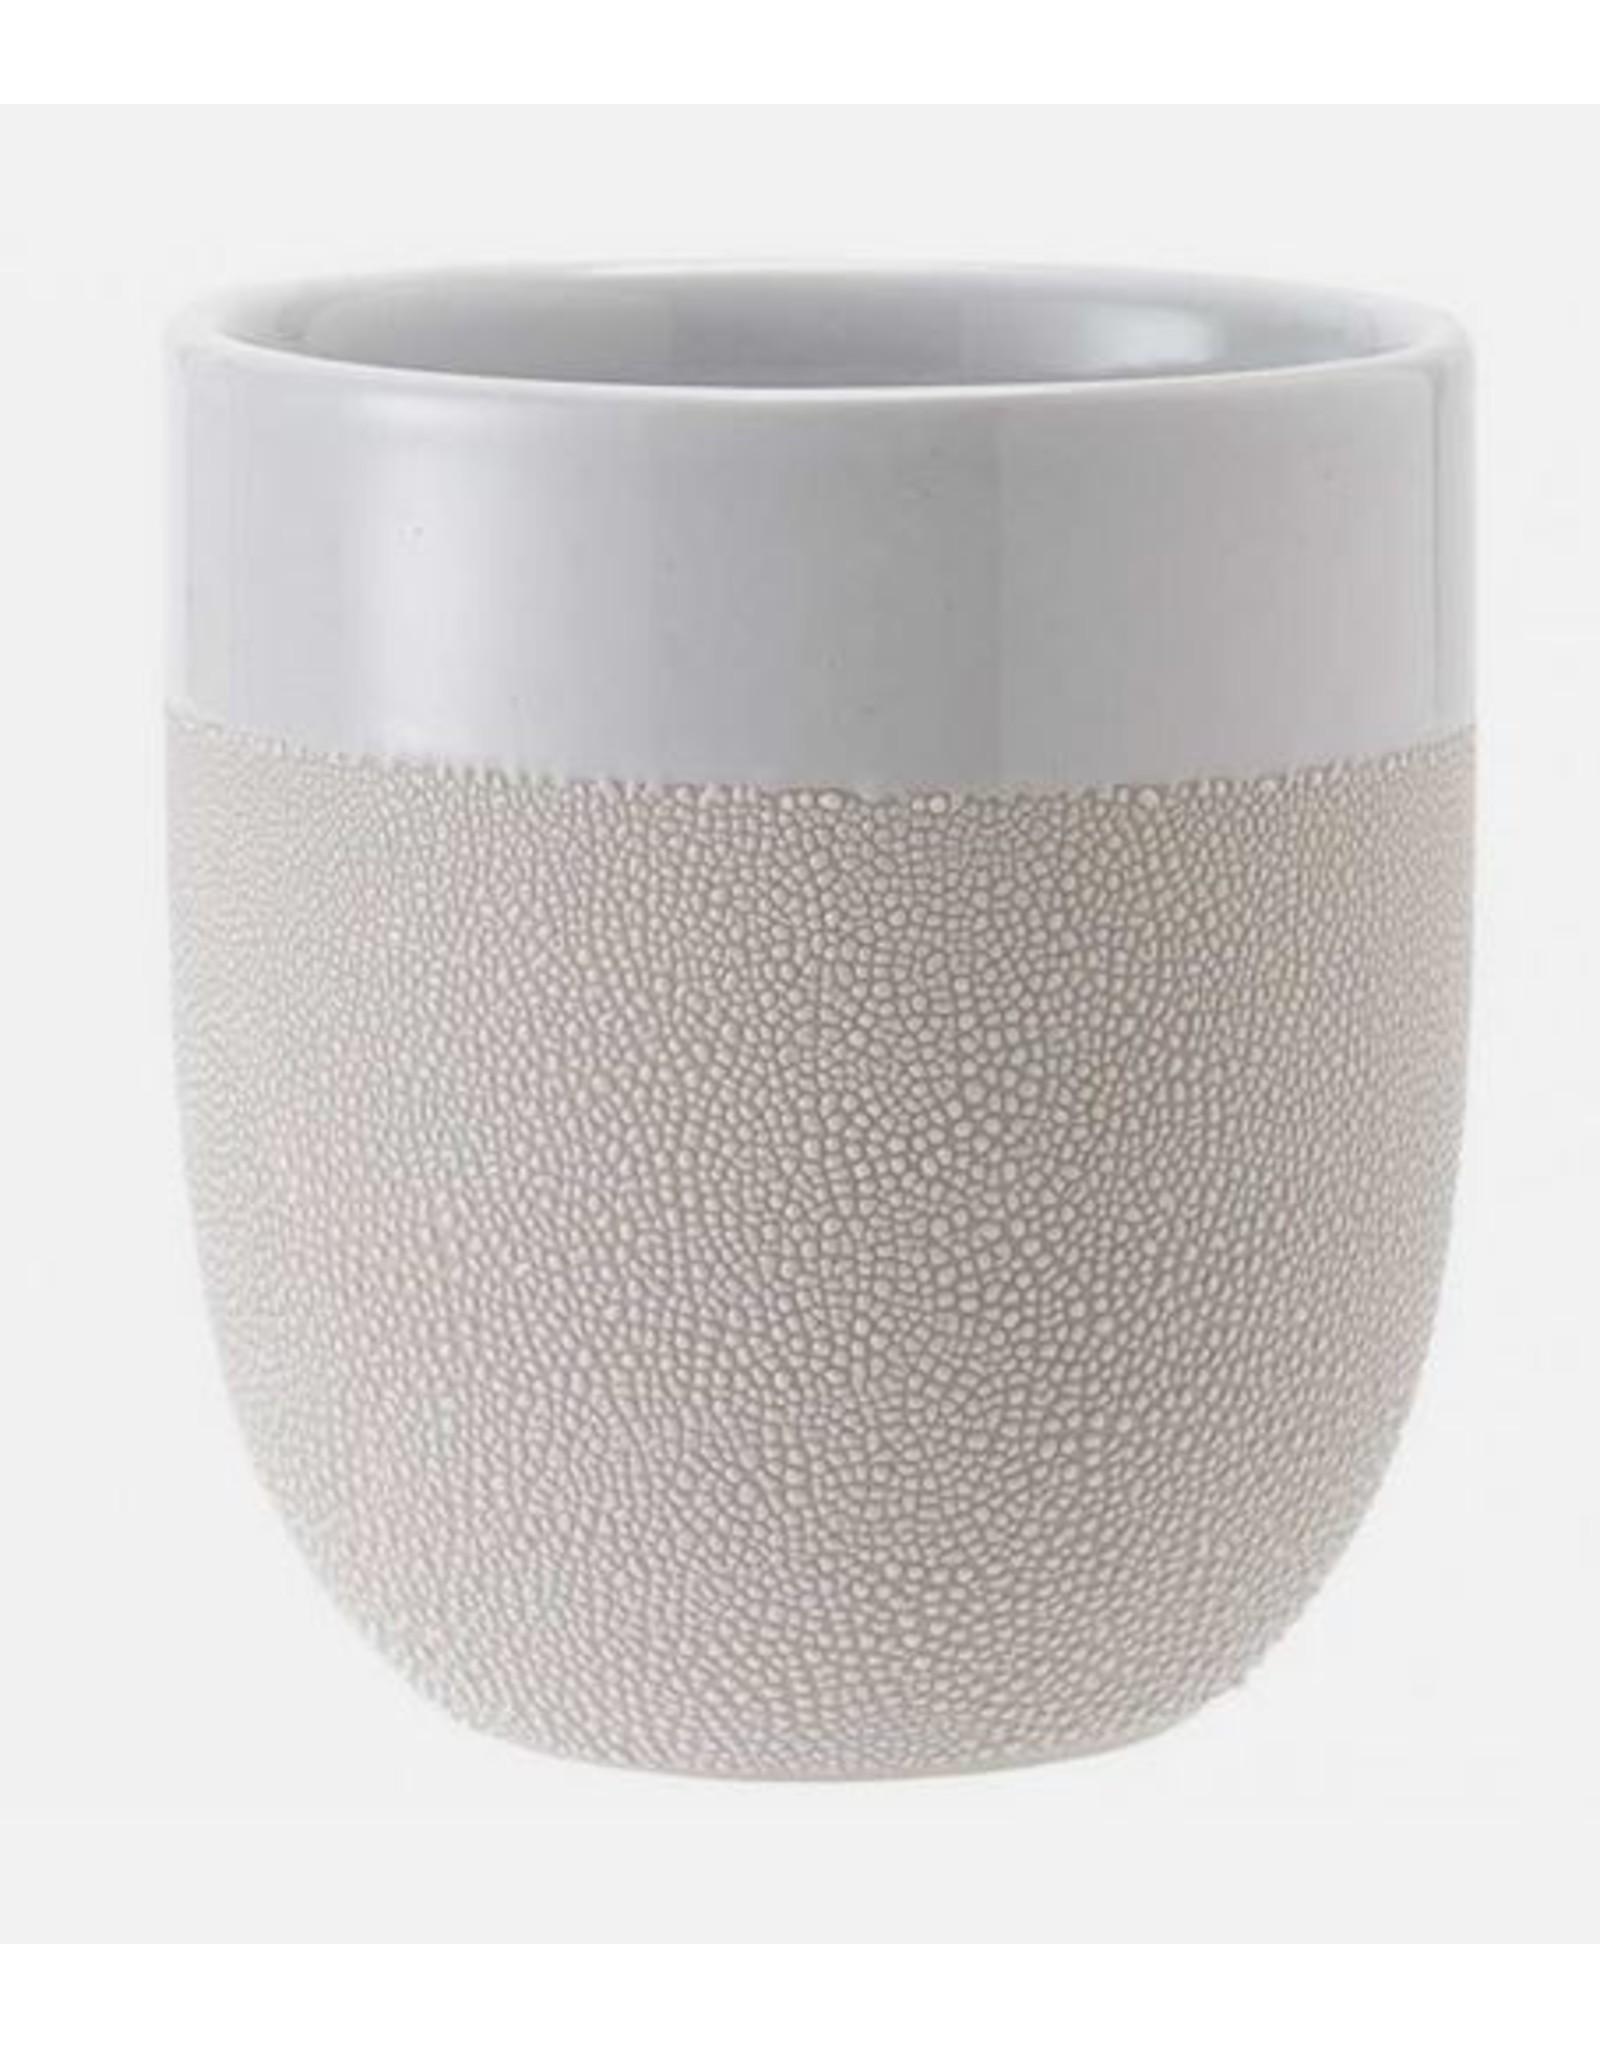 Ladelle Cafe Textured White Tumbler